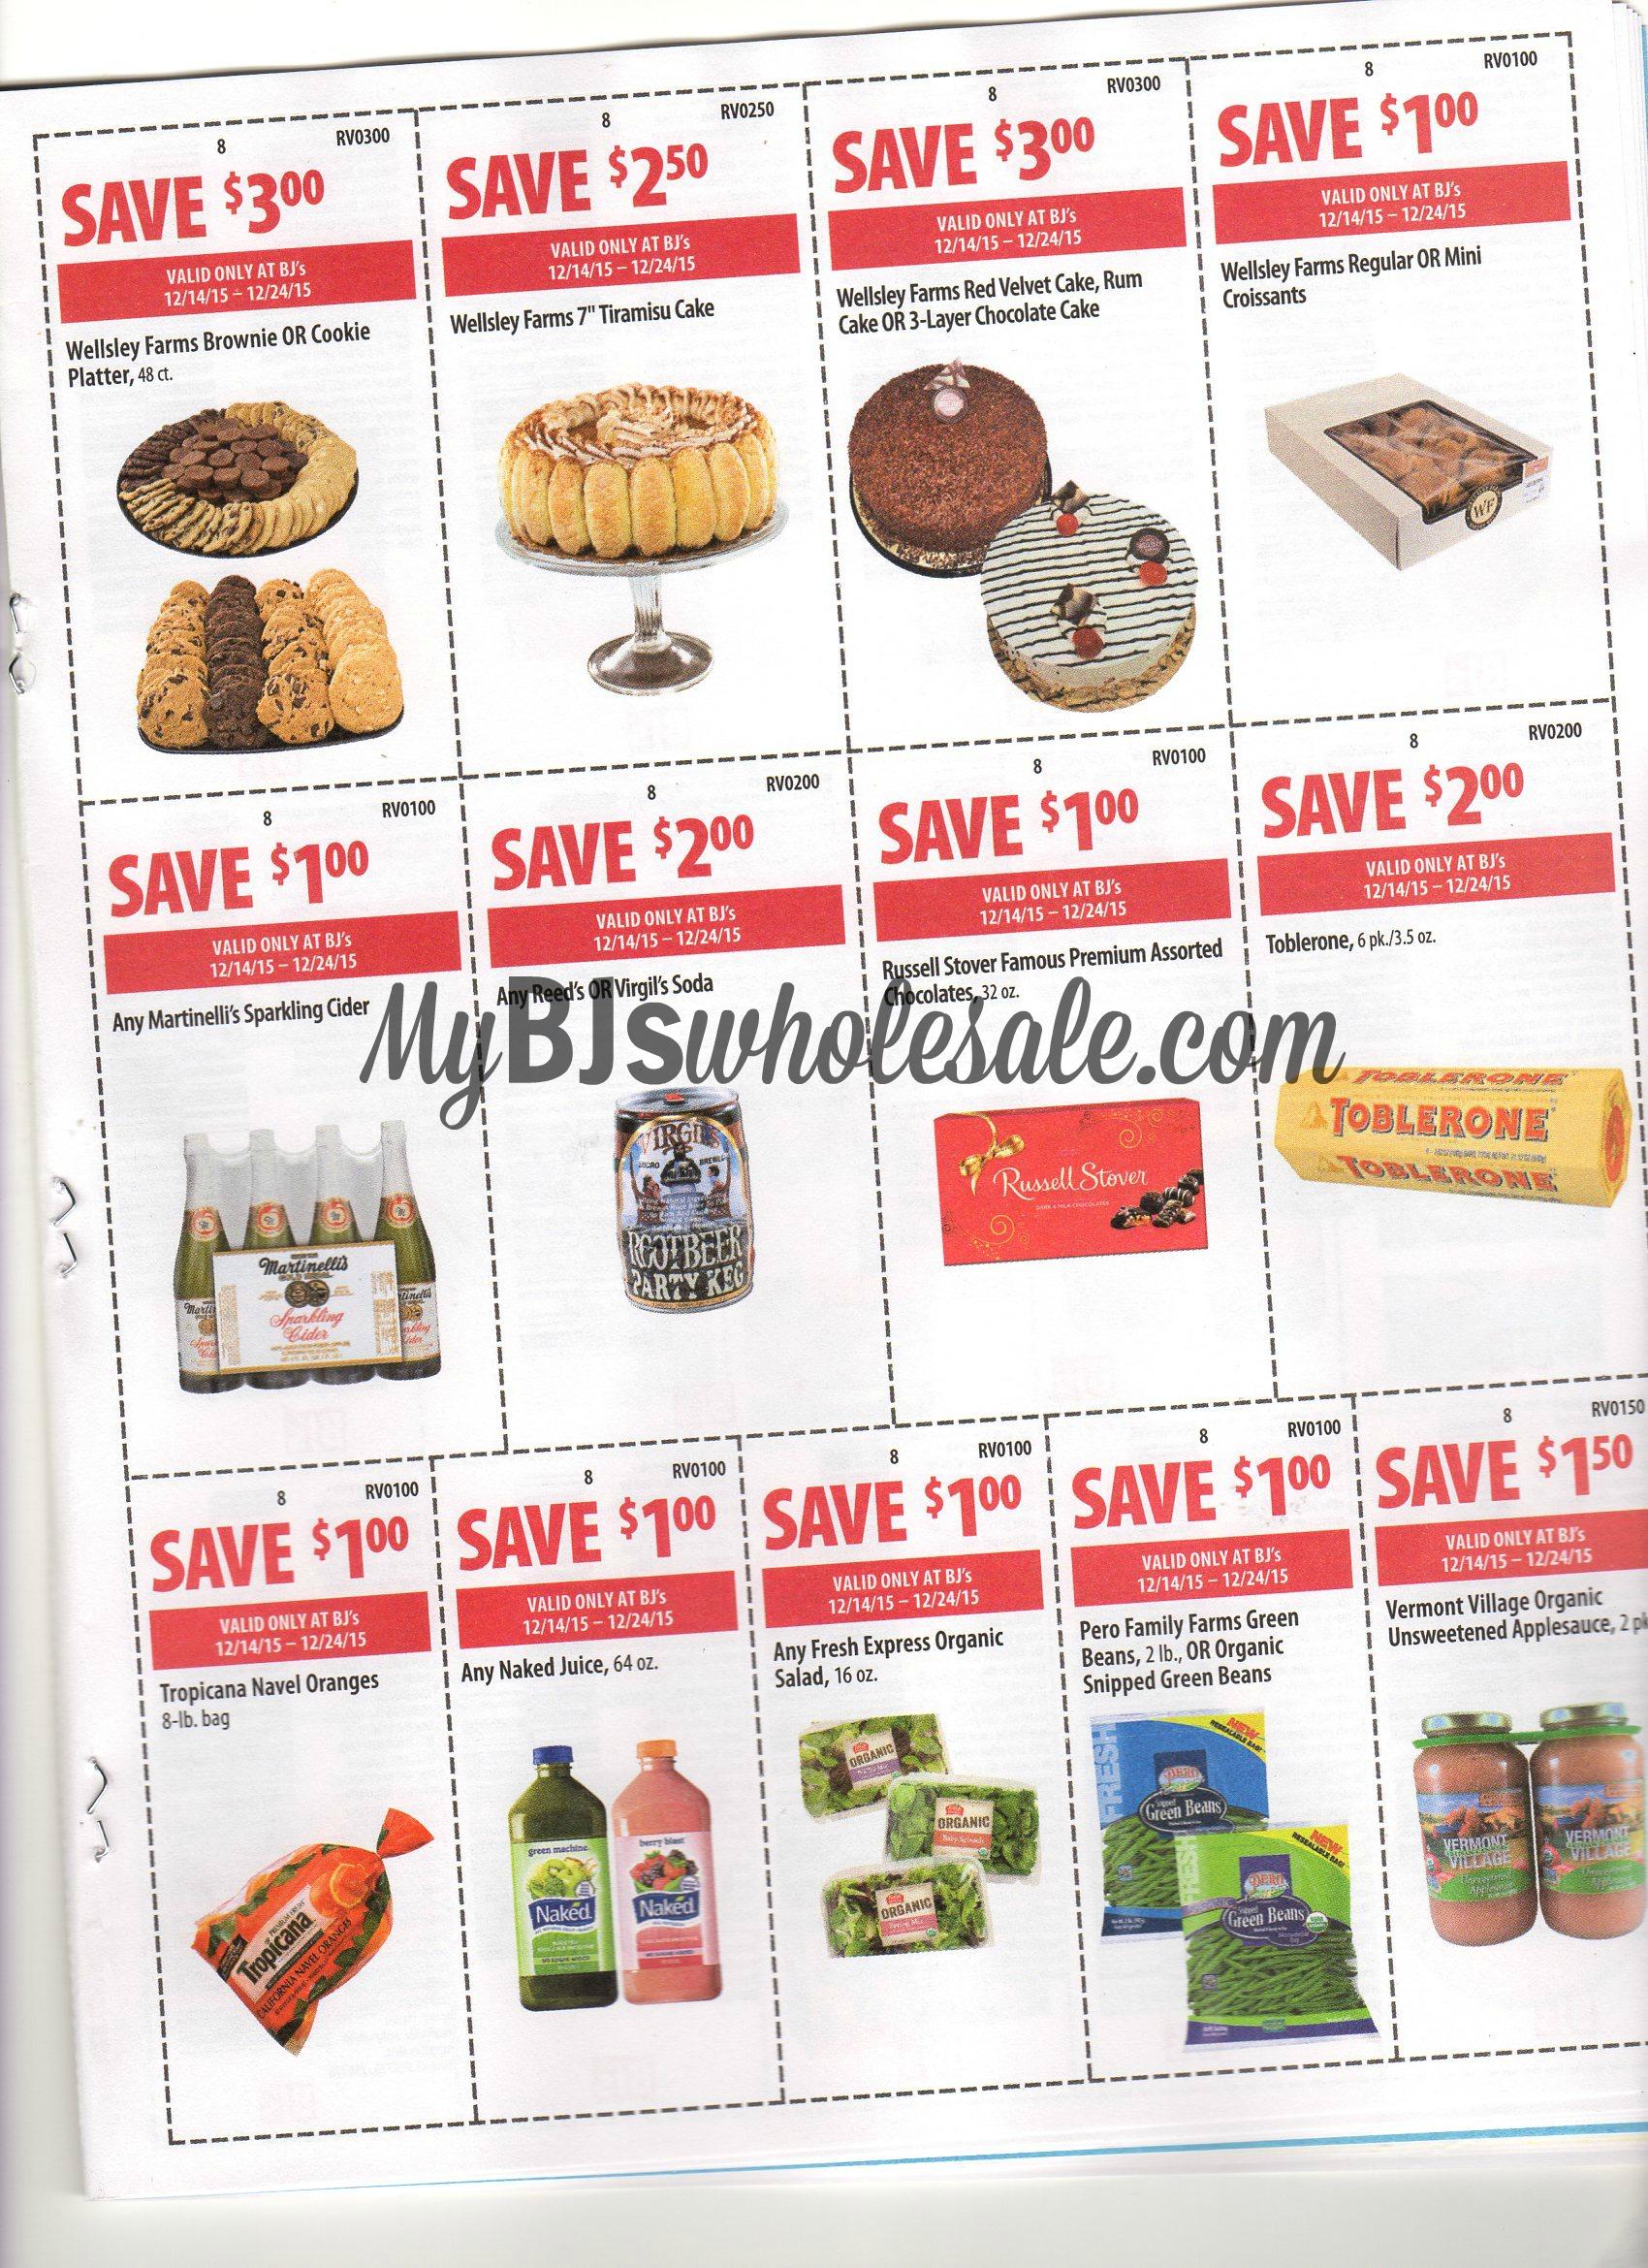 image regarding Bjs Printable Pass titled Bj discount codes : Restraunt vouchers